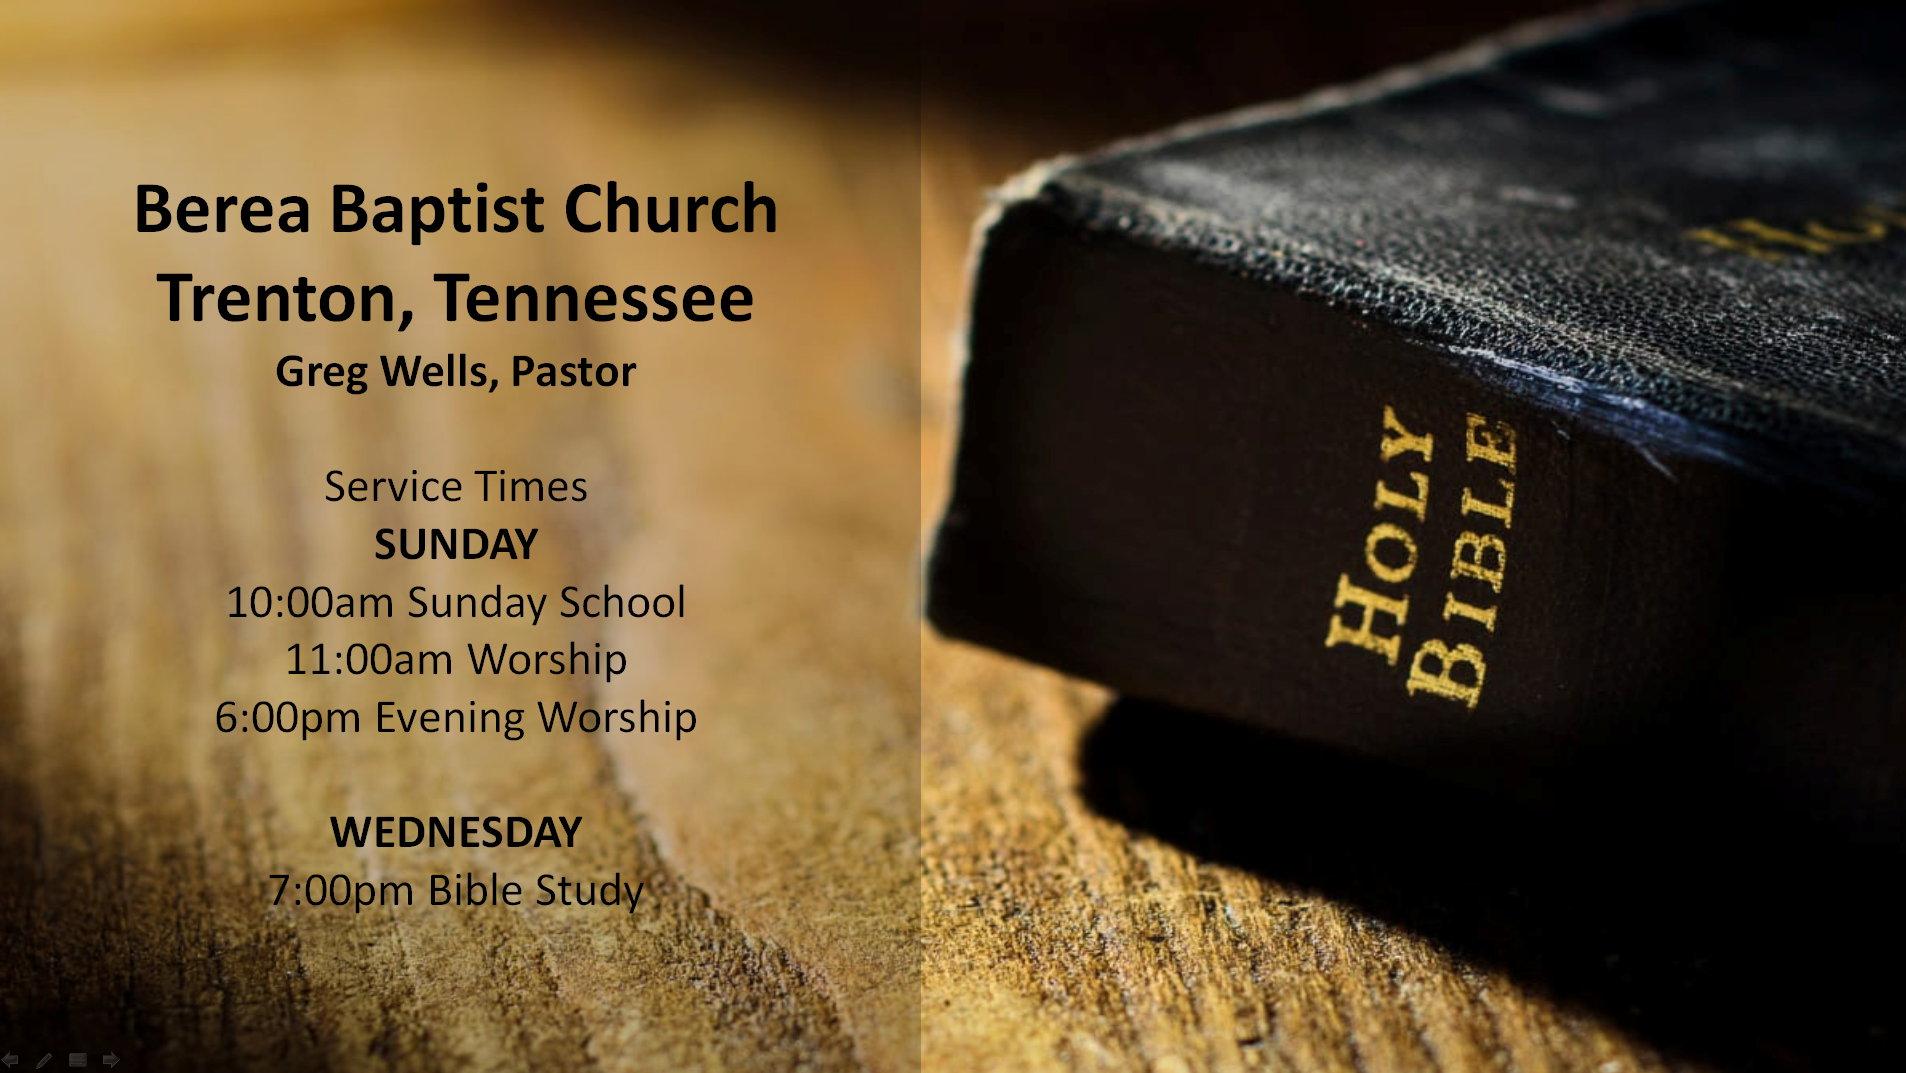 Berea Baptist Church of Trenton, TN